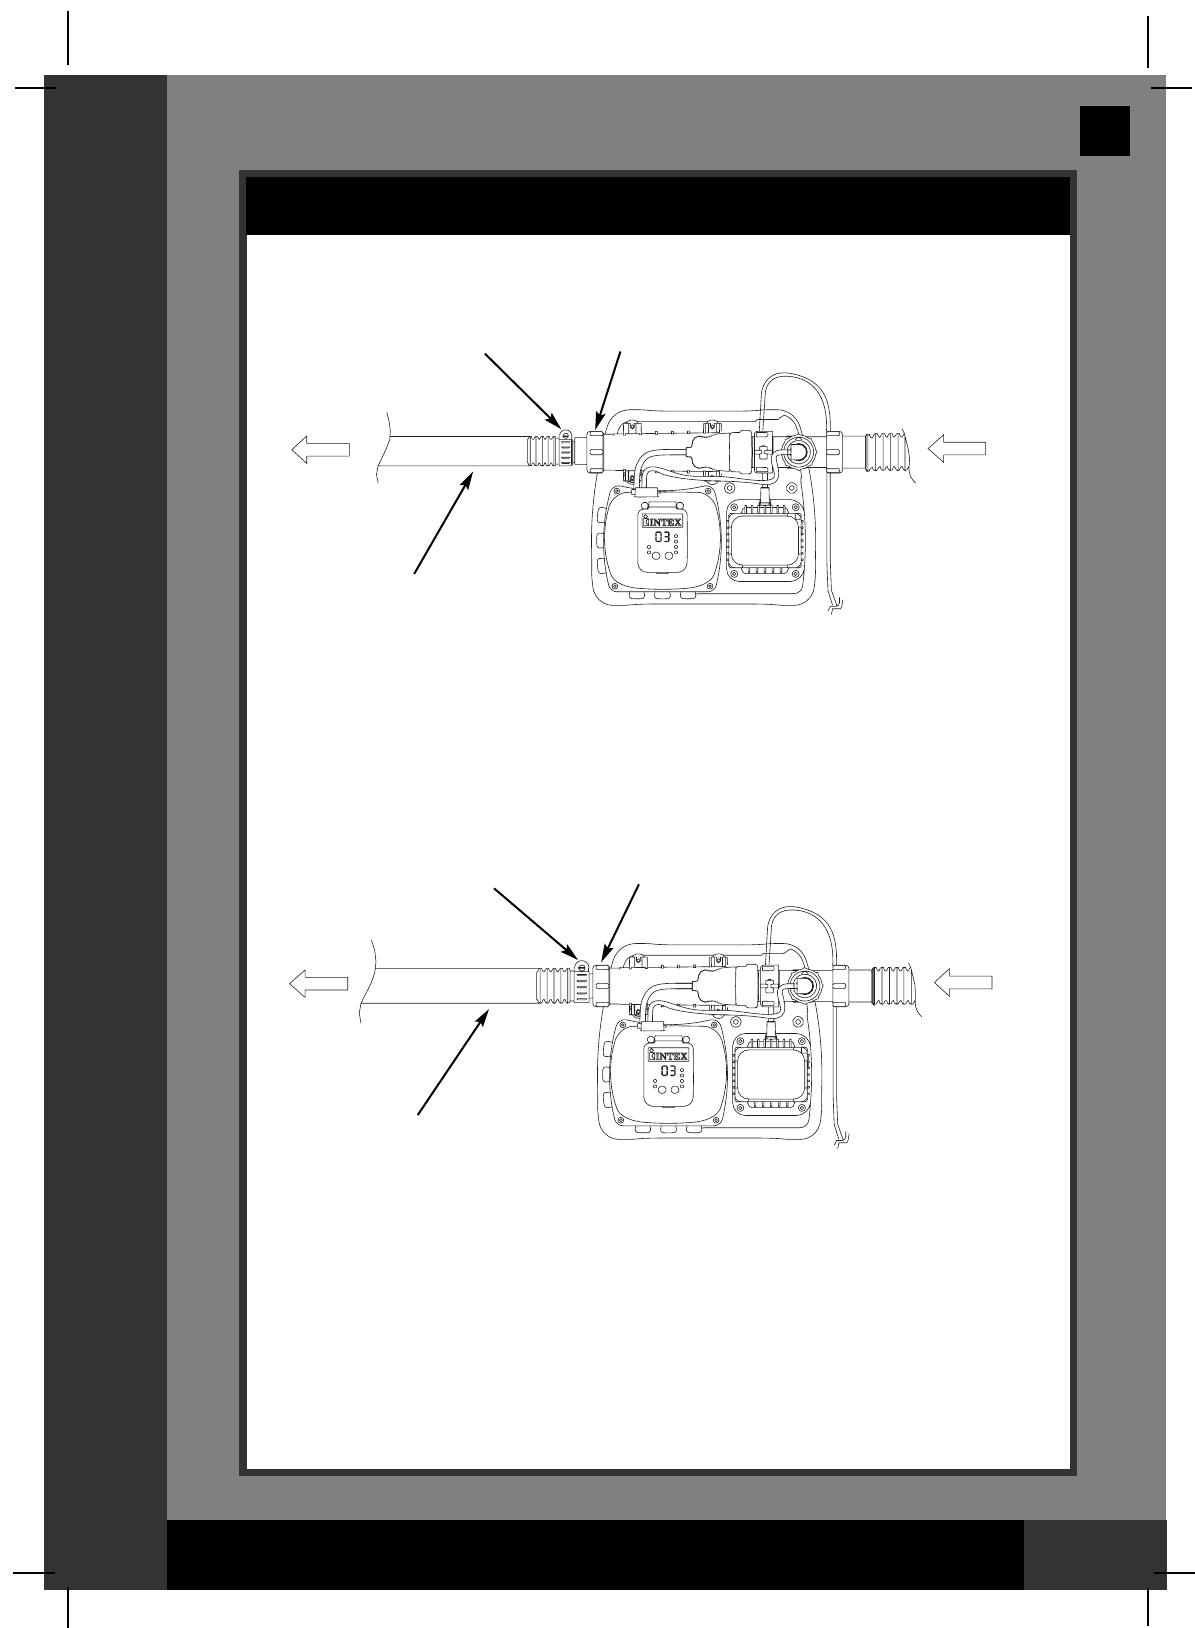 Handleiding Intex 8110 Krystal Clear De Luxe Pagina 12 Van 31 Pool Pump Wiring Diagram English